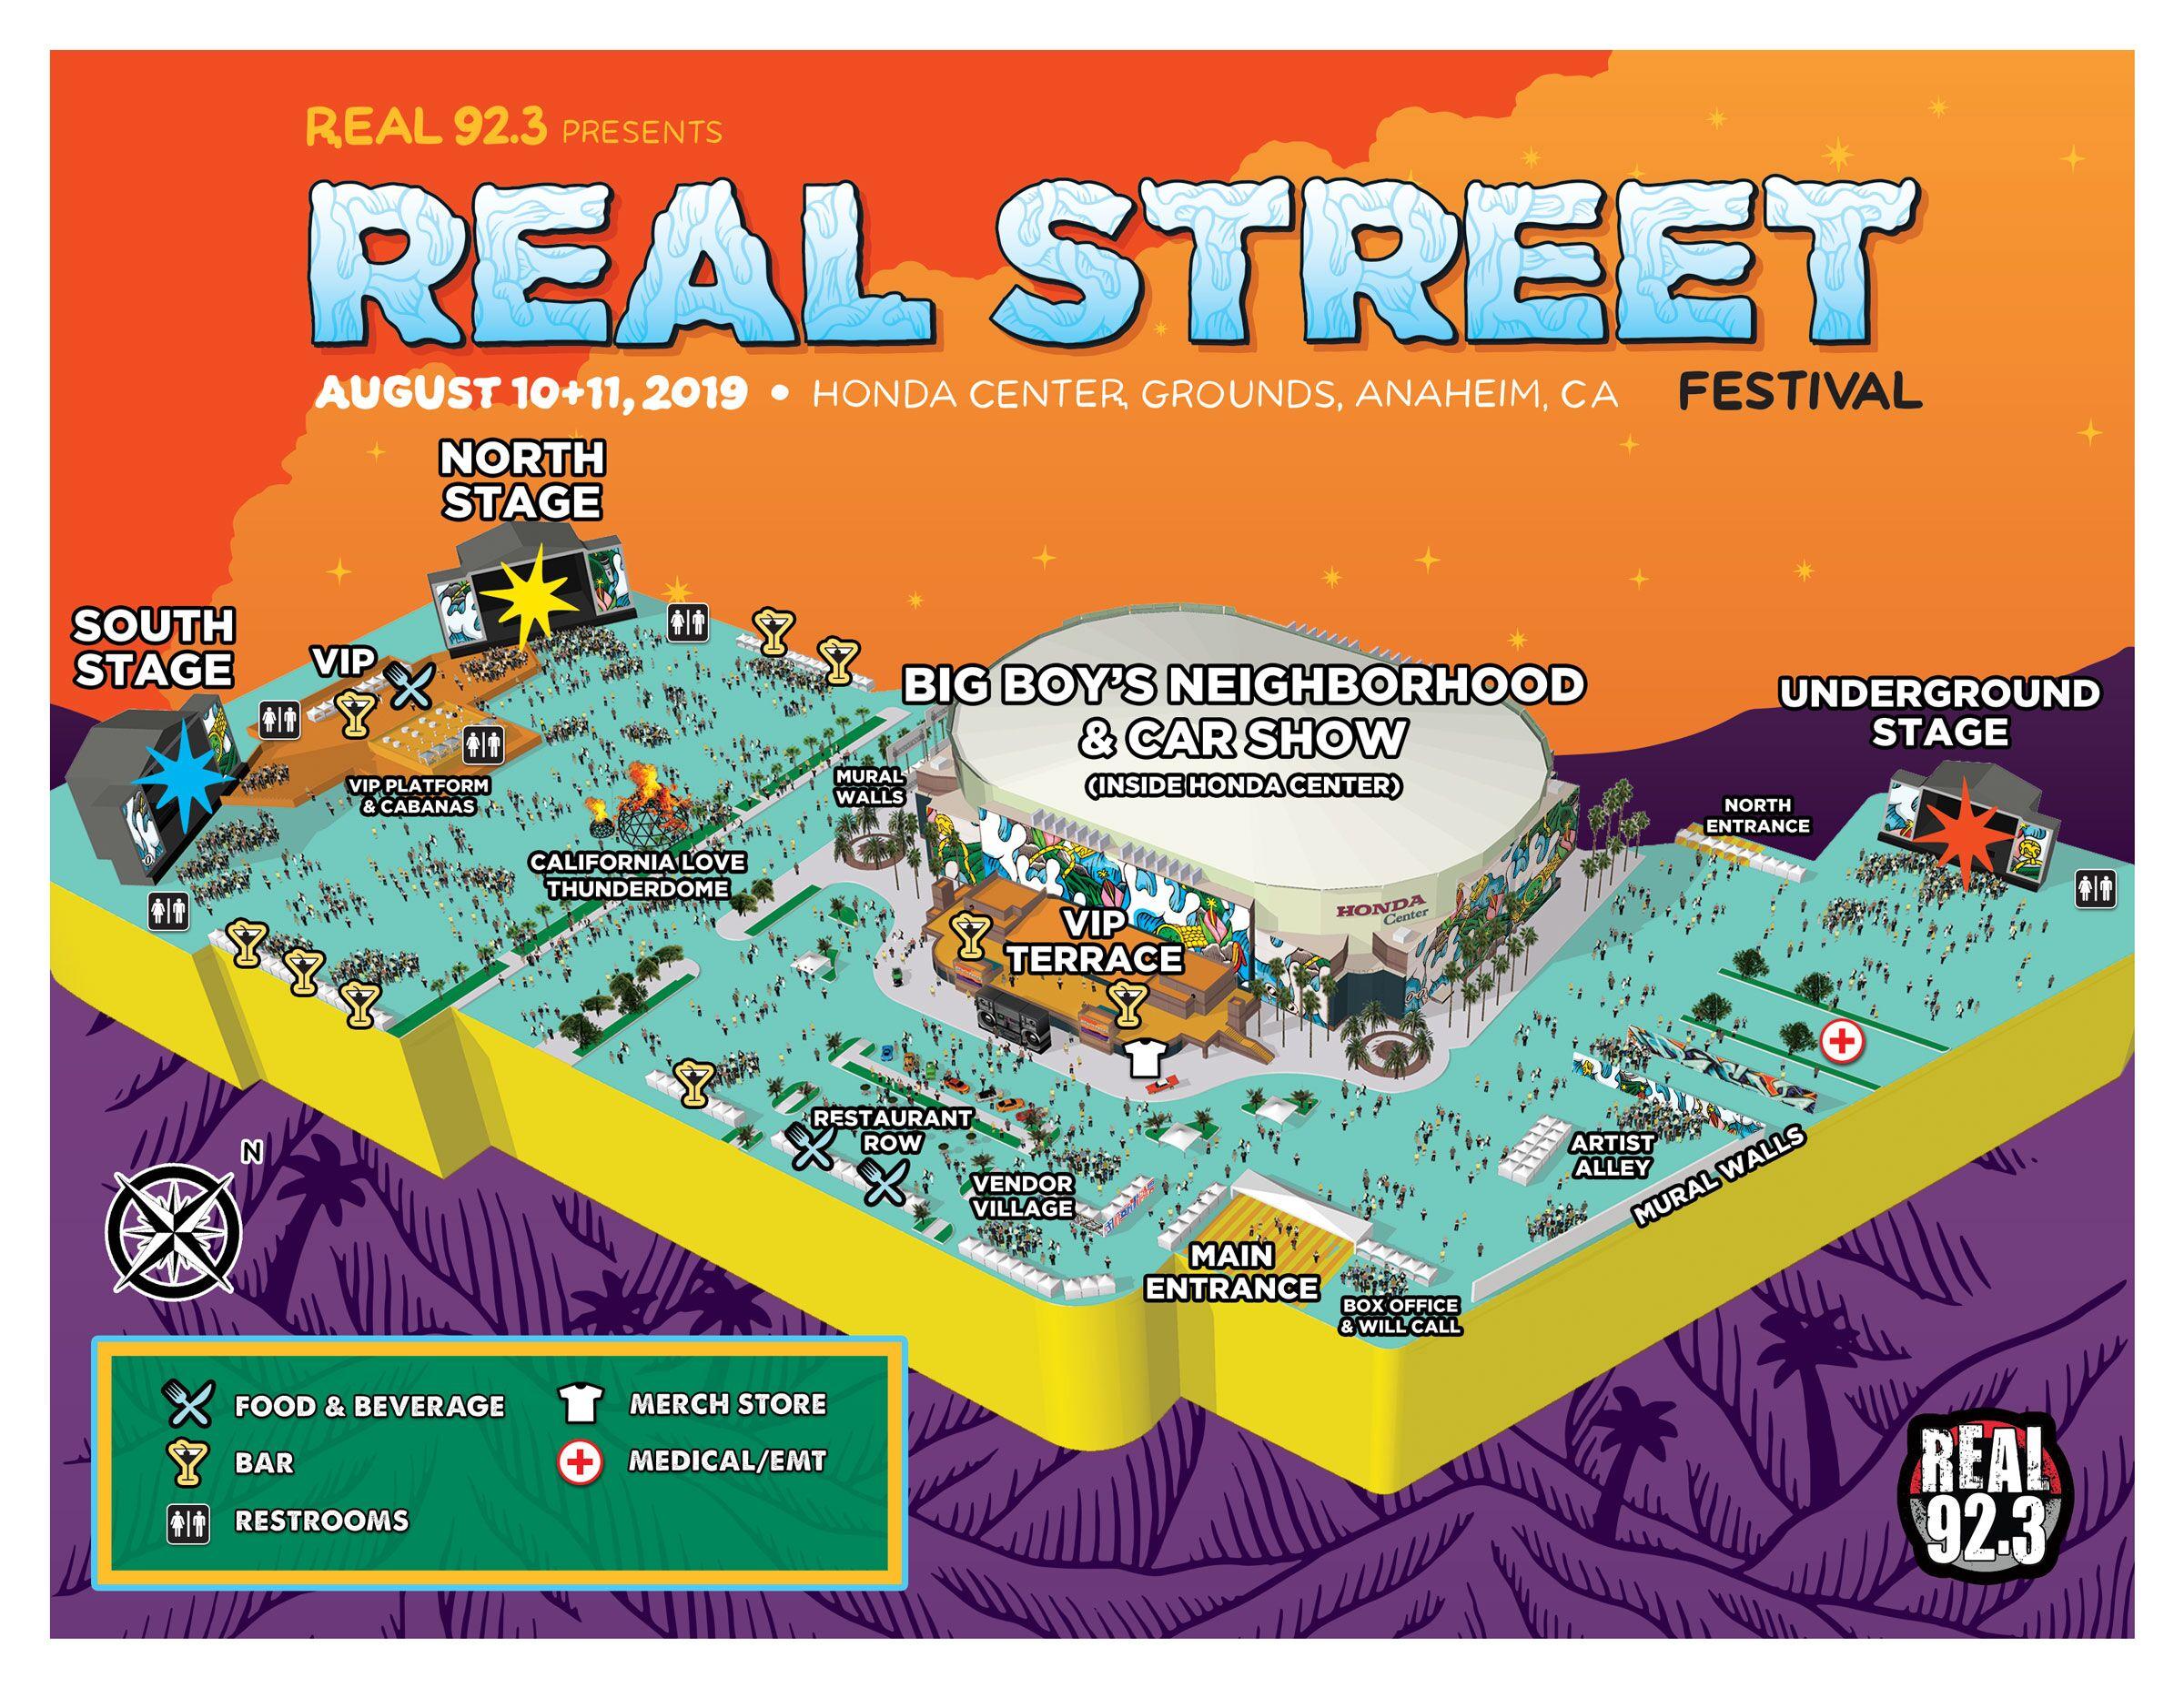 REAL STREET map.jpeg